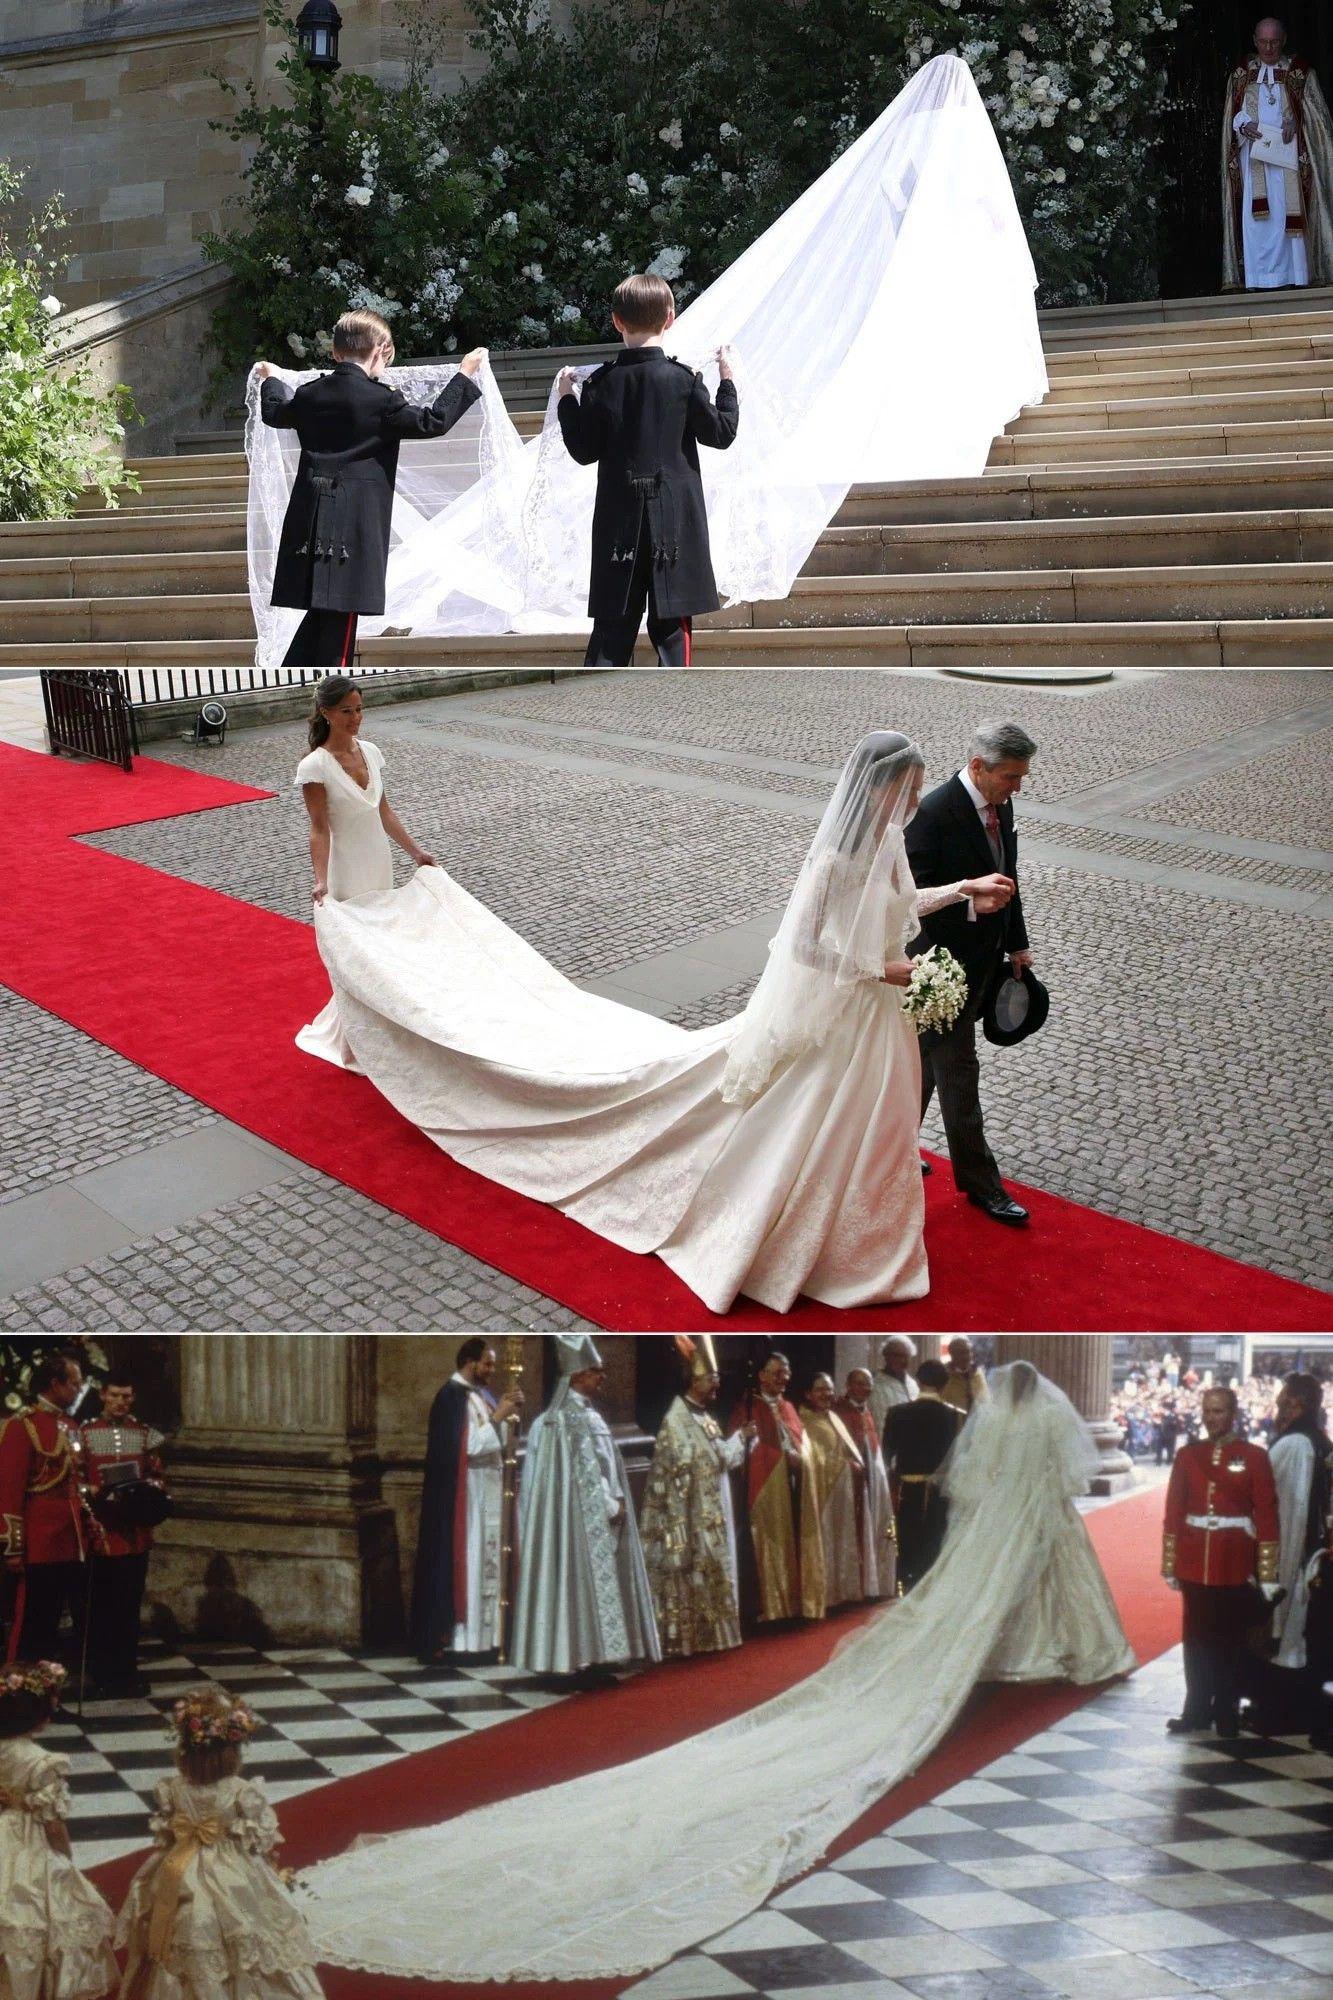 Pin By Major Tricolour On Royalty Princess Diana Wedding Princess Diana Wedding Dress Diana Wedding [ 2000 x 1333 Pixel ]